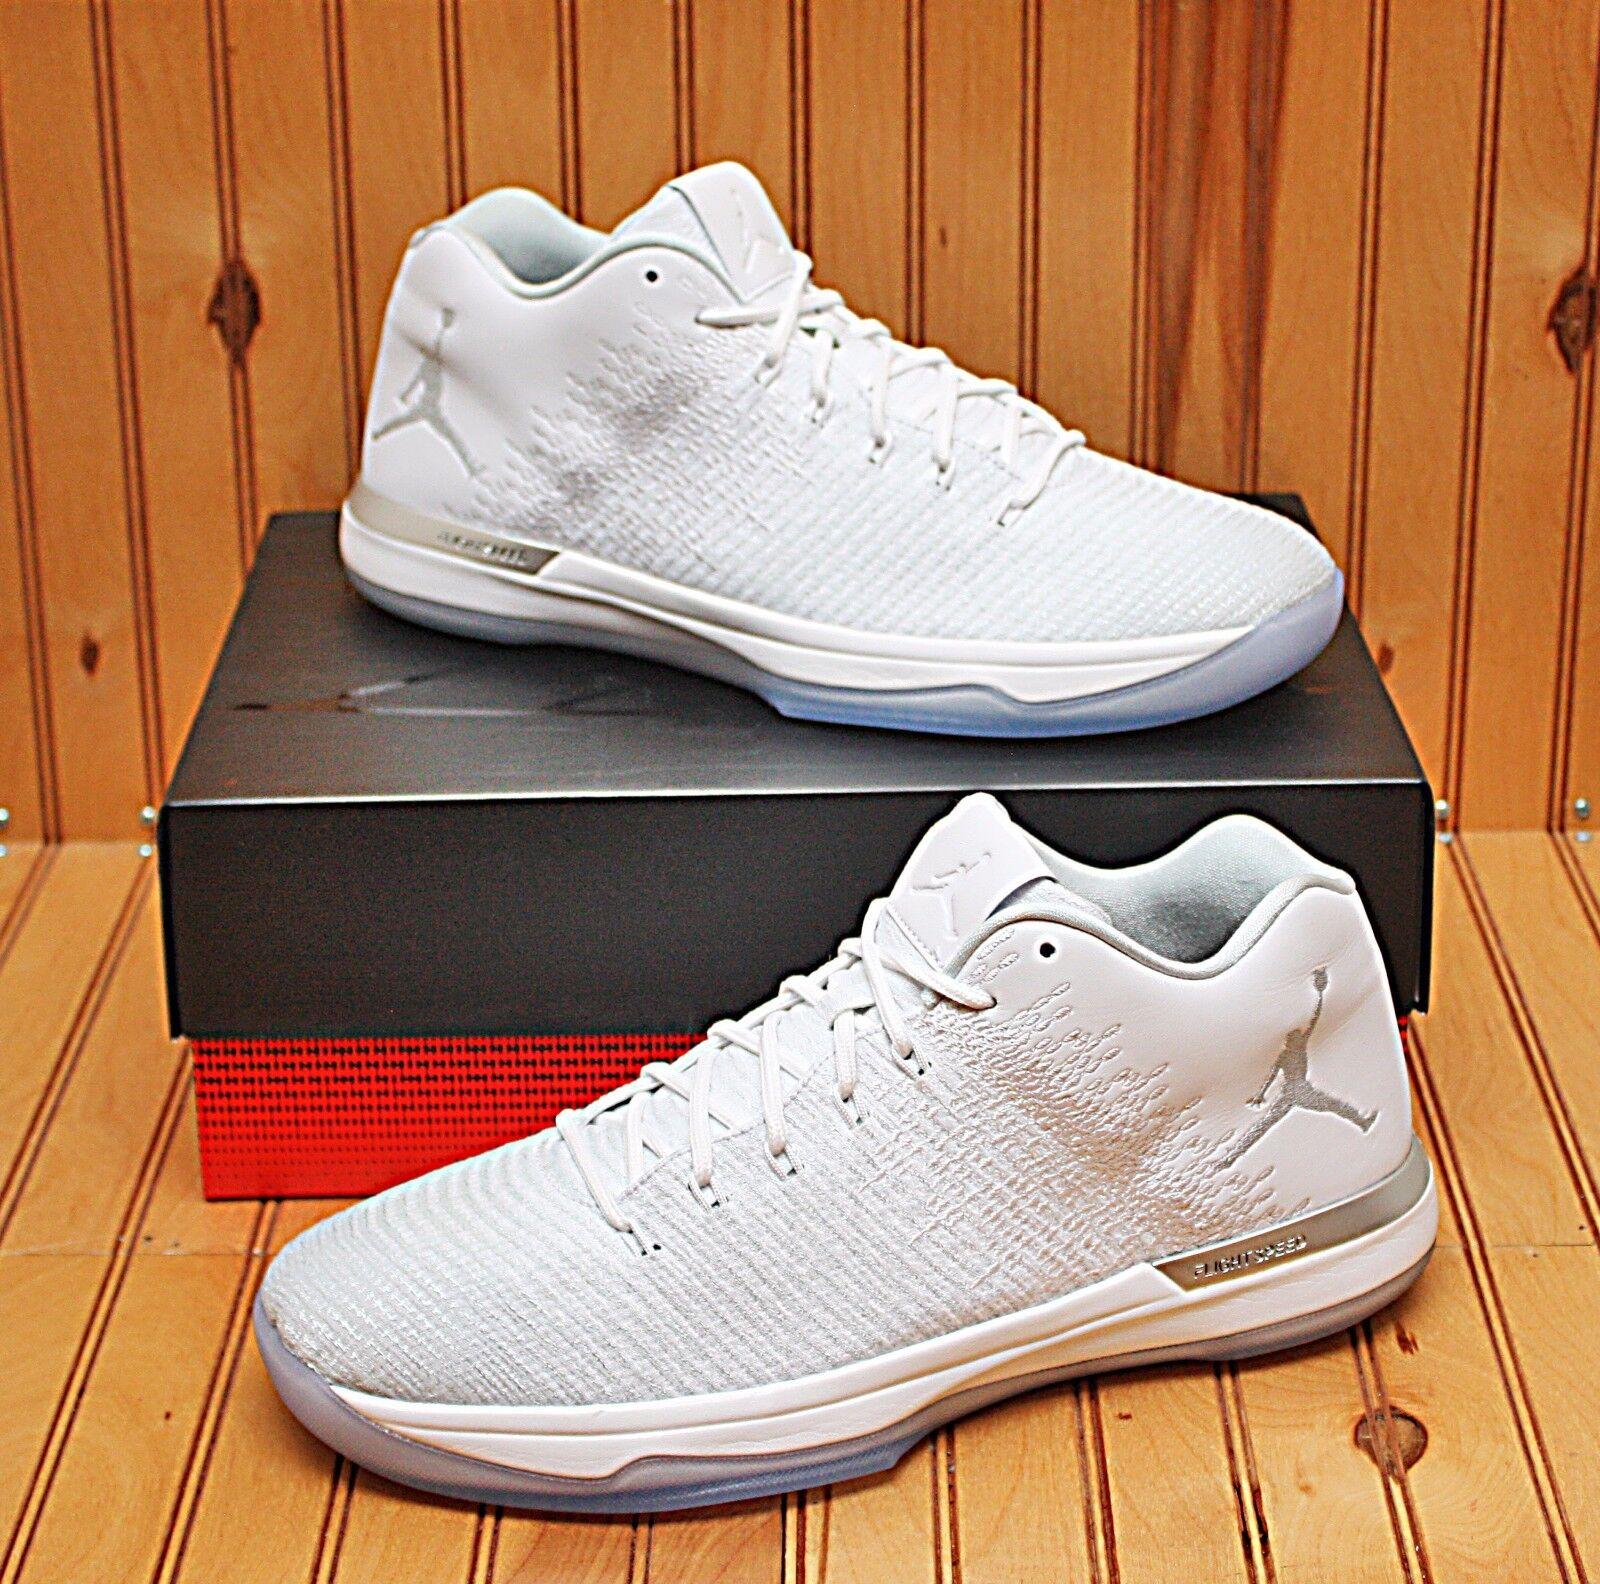 ee2ae555e3387d 2016 Nike Air Jordan XXXI 31 Low Size 12.5 - White Pure Platinum - 897564  100